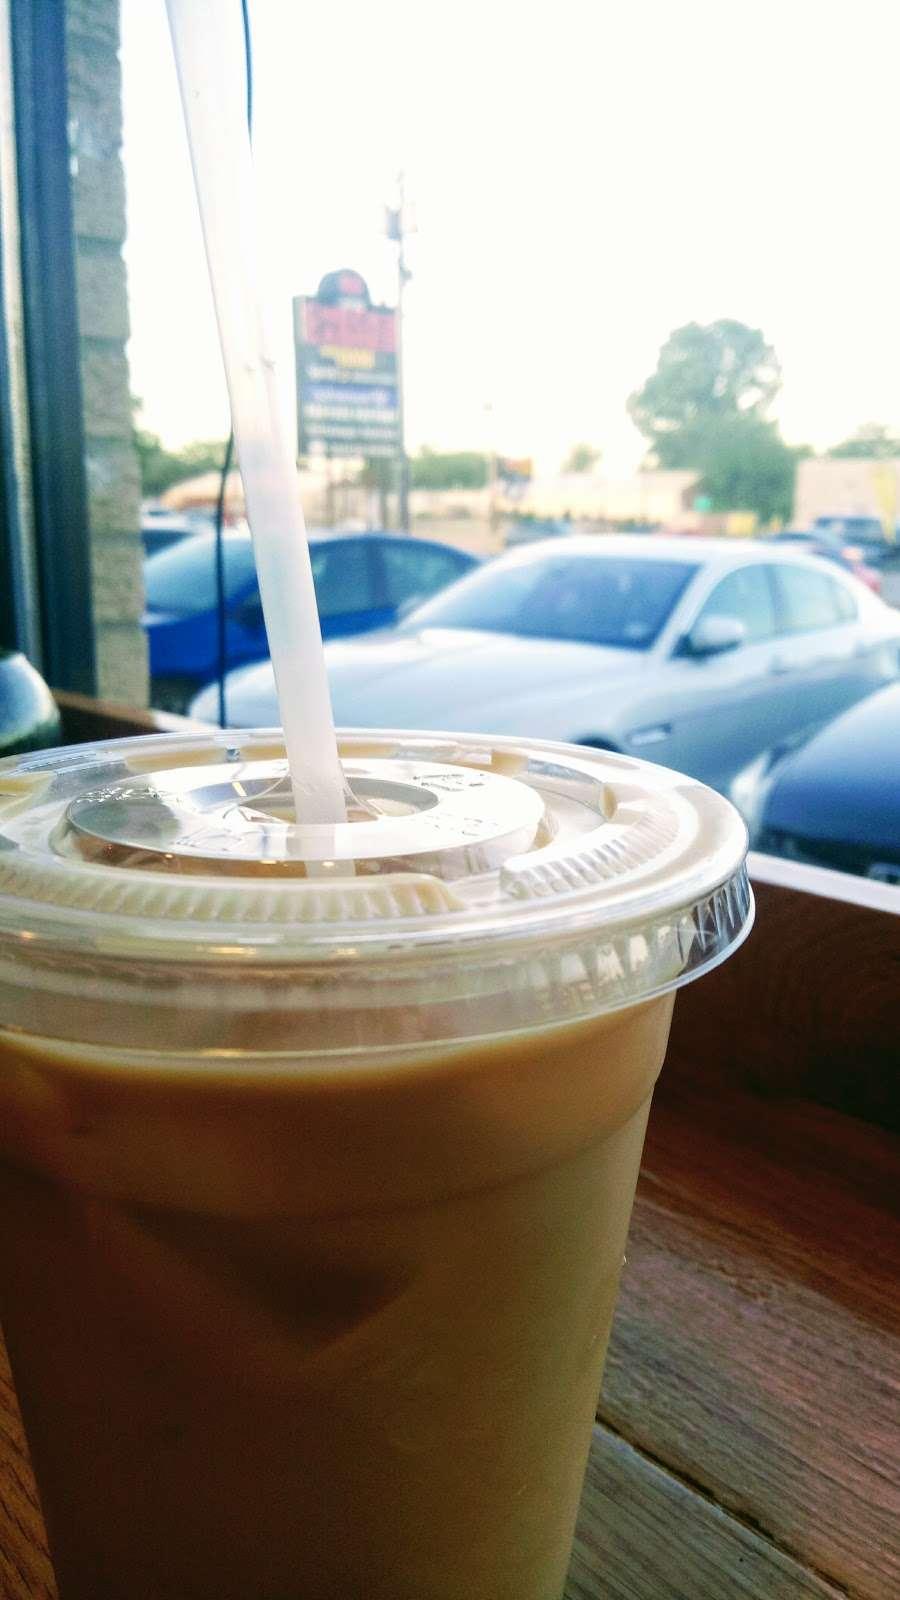 Koffeewagon Roasters - cafe  | Photo 10 of 10 | Address: 155 NJ-17, Hasbrouck Heights, NJ 07604, USA | Phone: (201) 426-0520